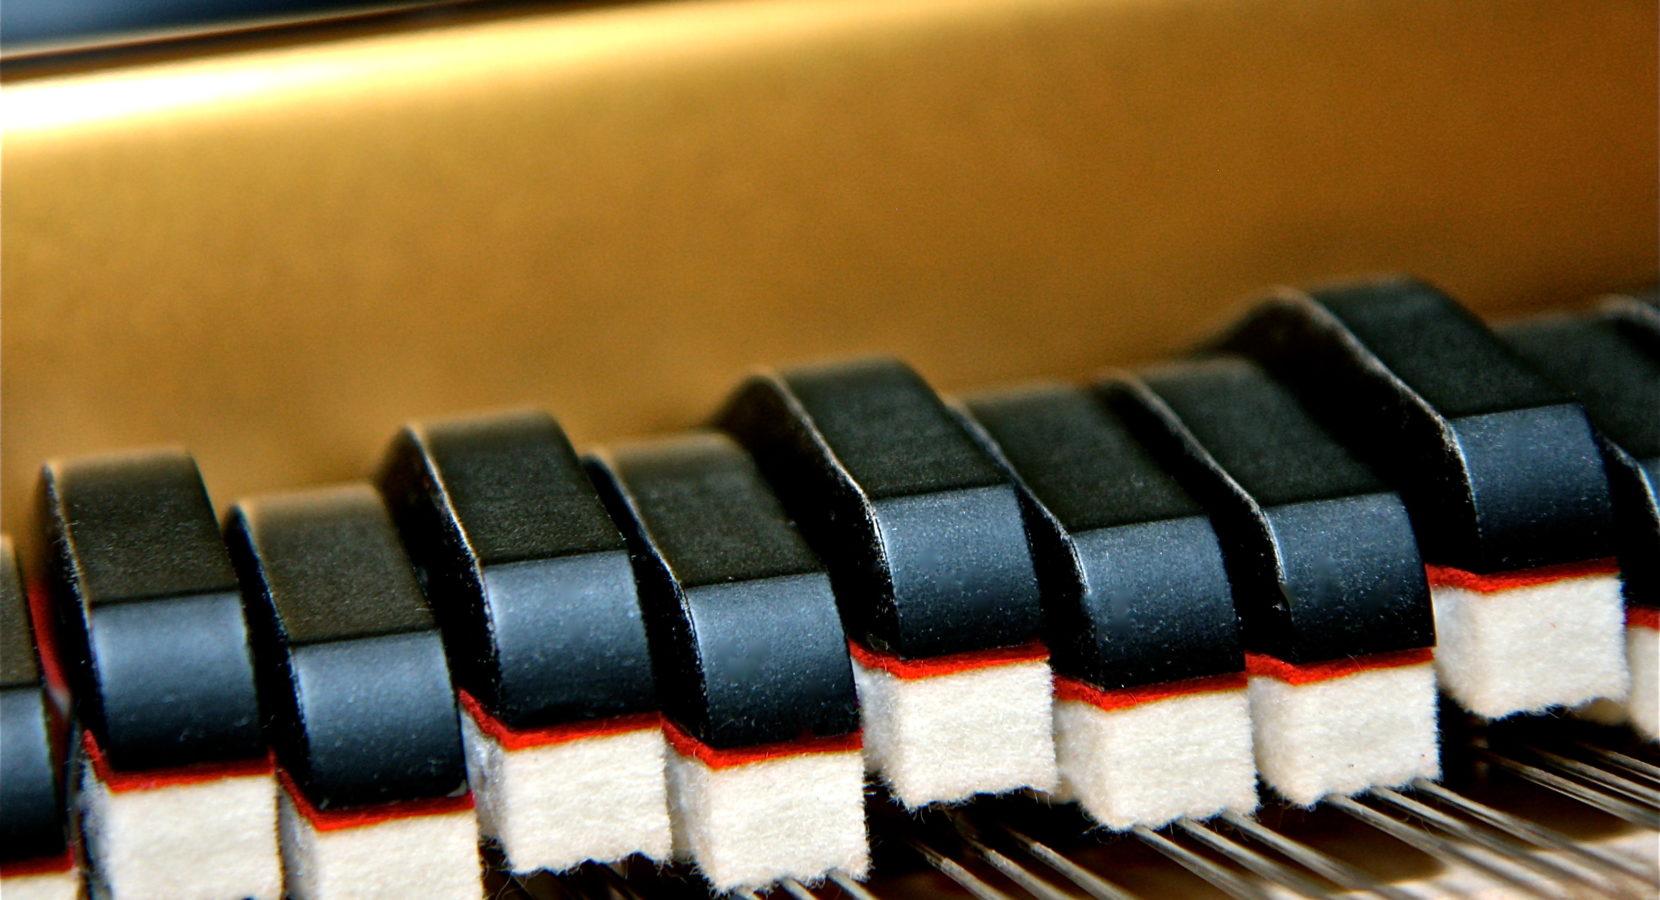 Grand Piano Passion™ | Chopin Waltz in B Minor Amplified - Grand